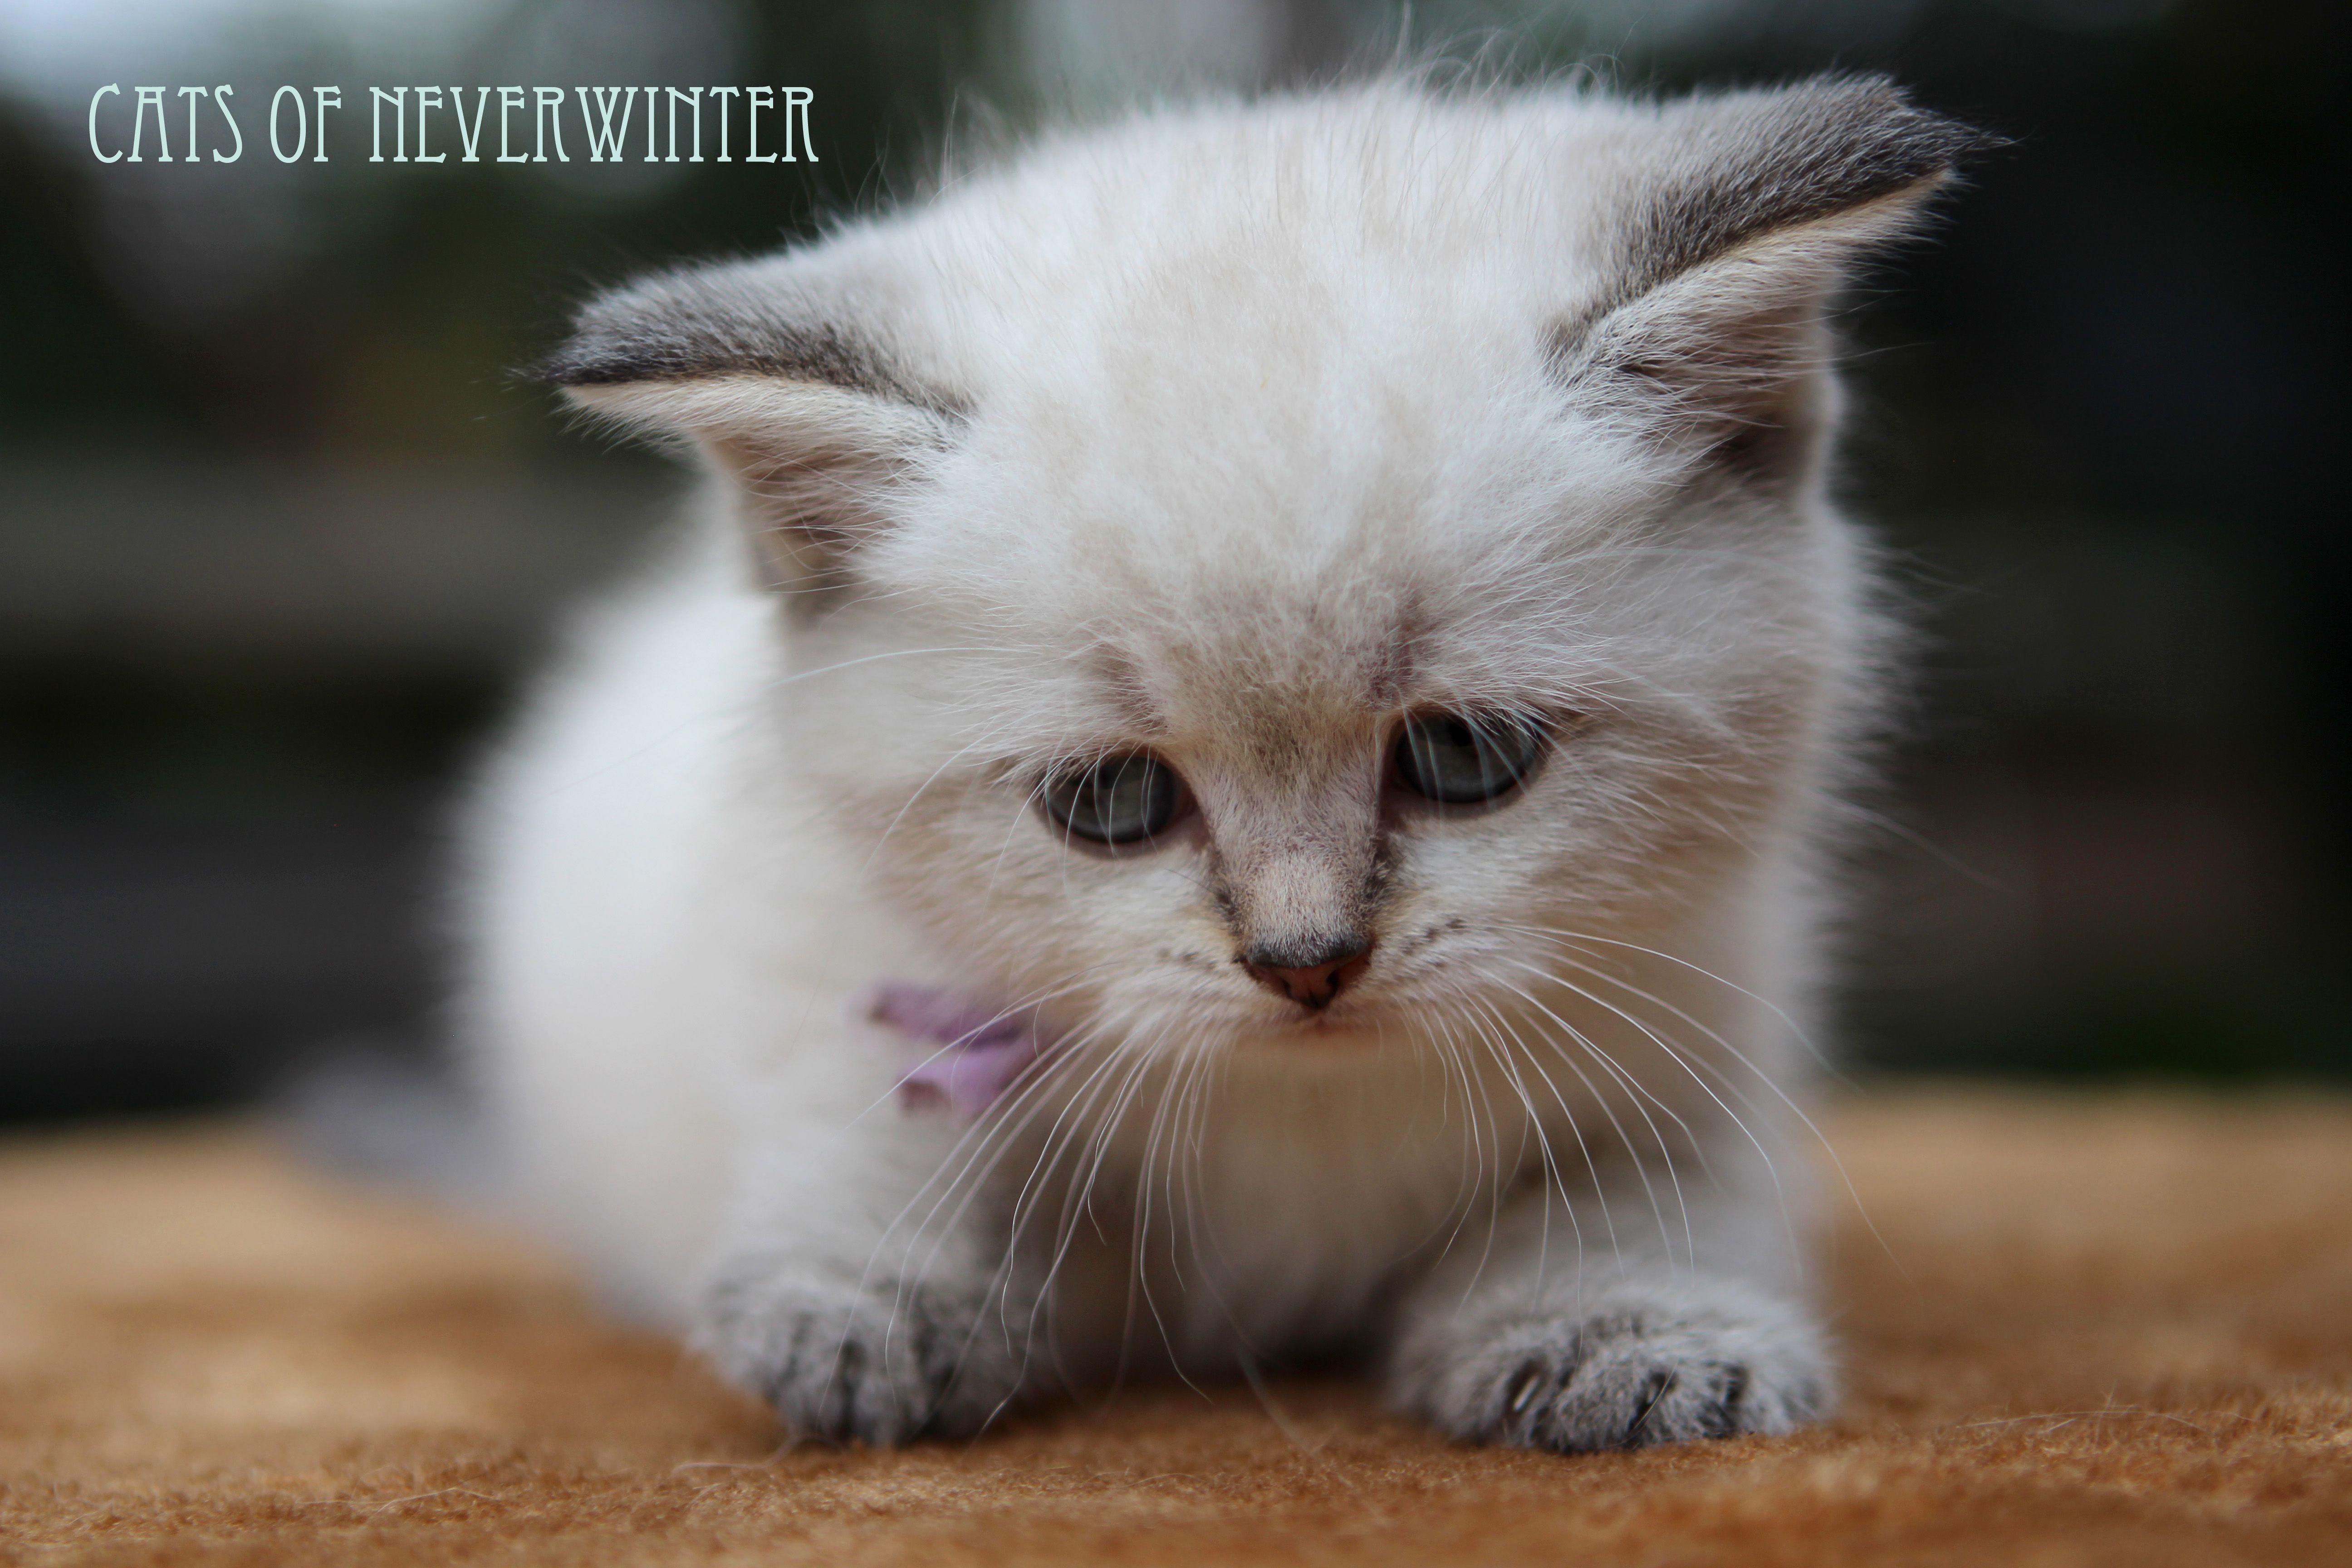 Our British Shorthair Kittens From Gaia Stars Stud From Feline Magic Georgie Porgie Pudding And Pie One Bro British Shorthair Kittens British Shorthair